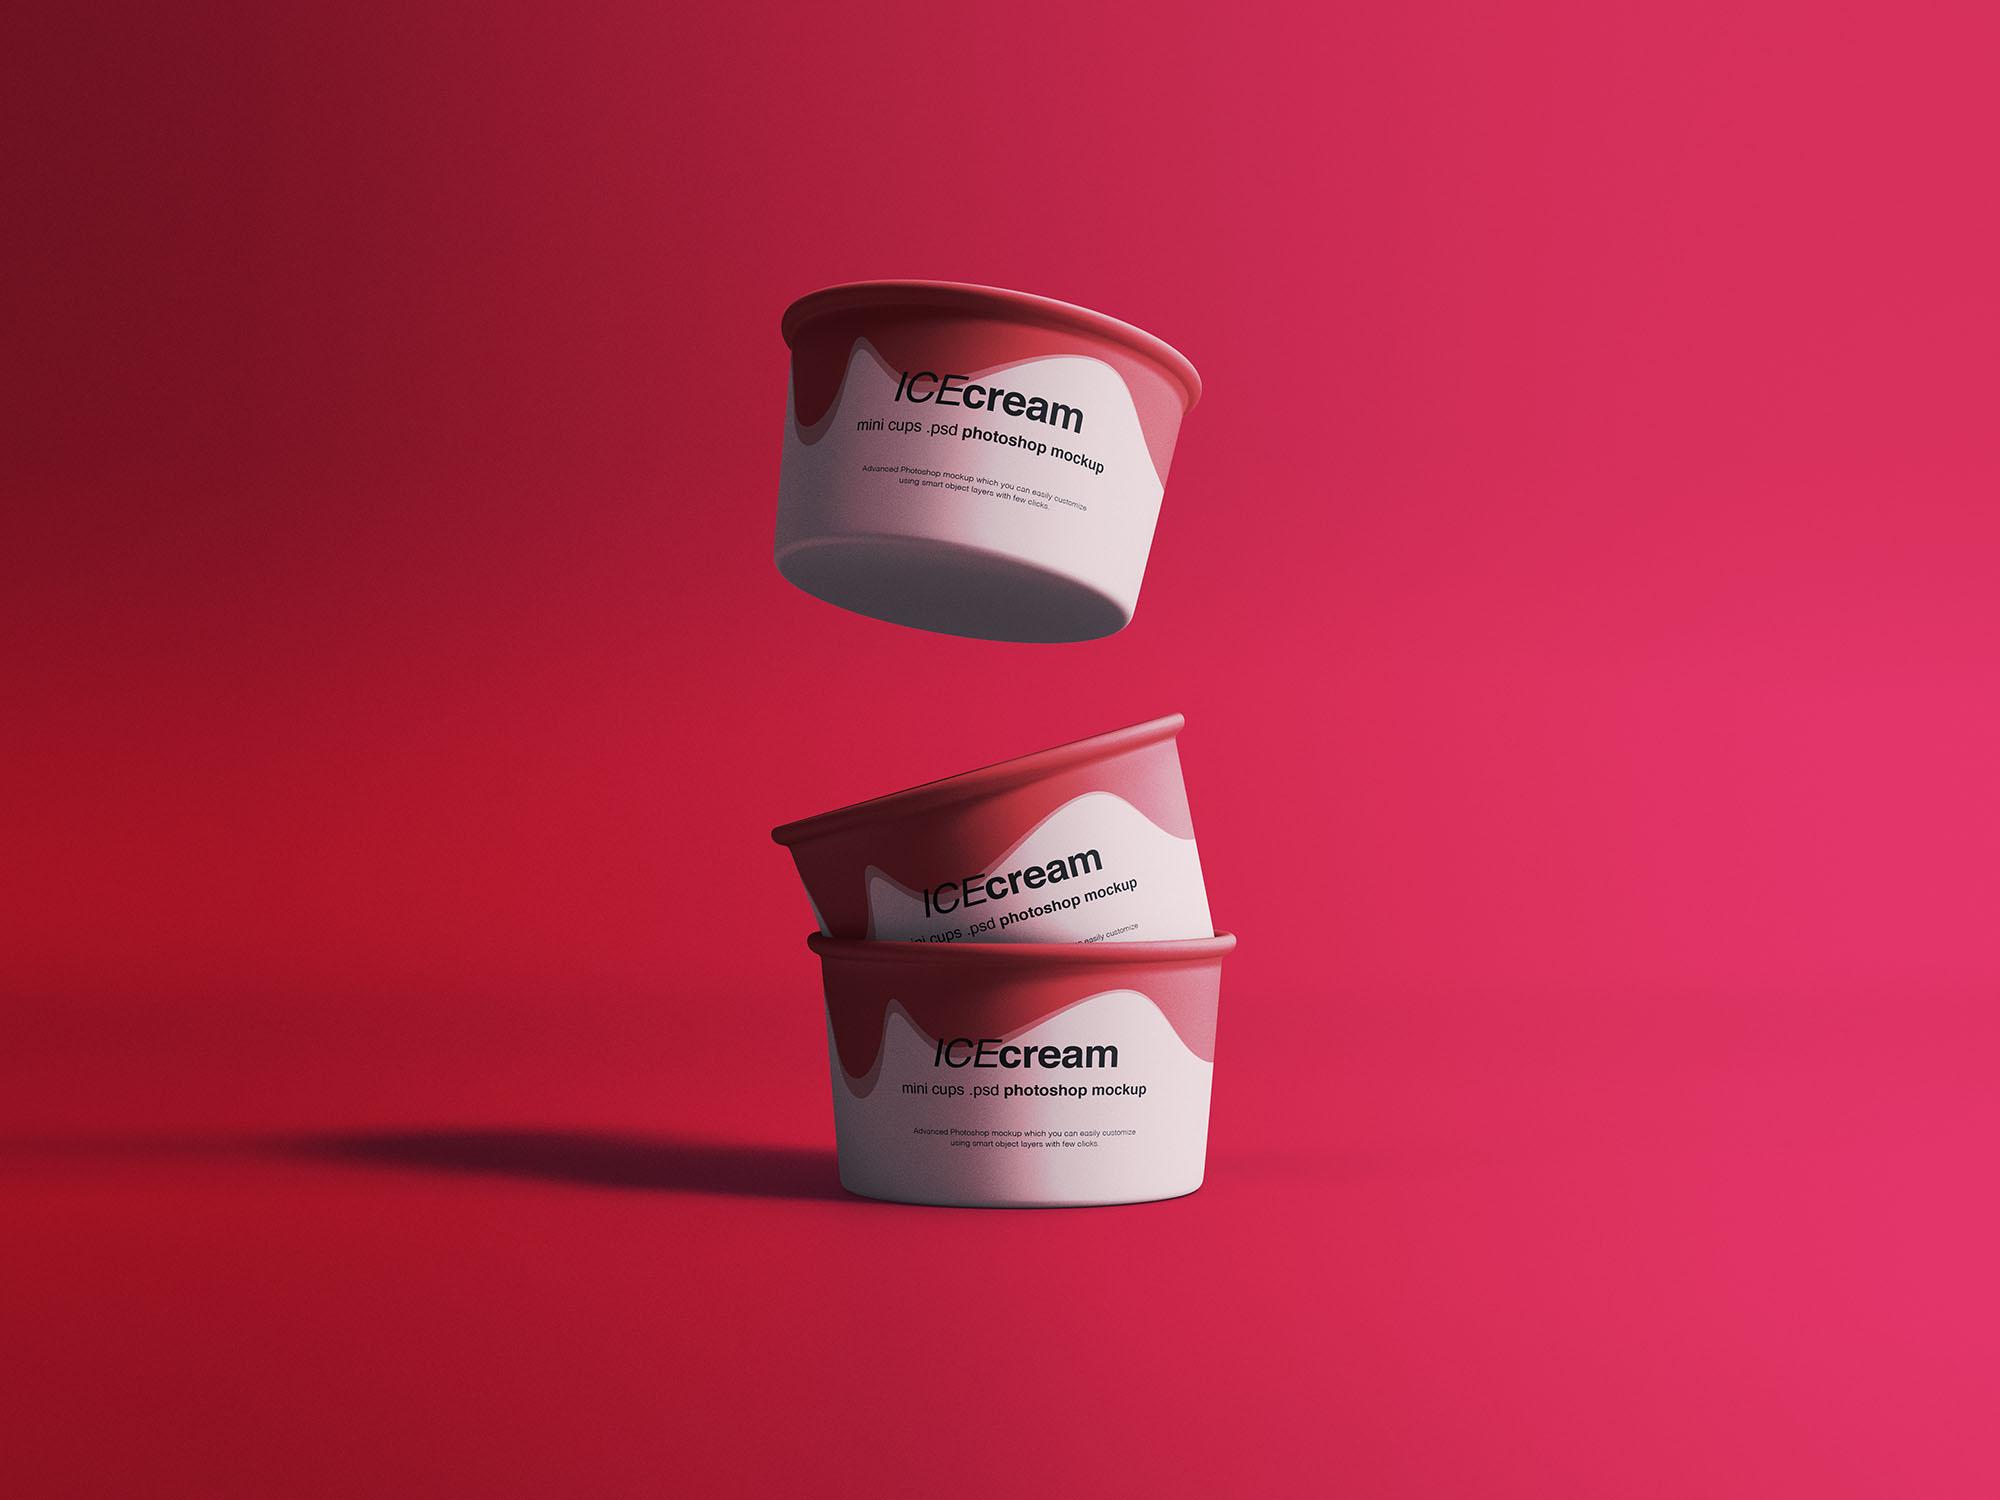 冰淇淋纸杯包装盒样机PSD模板 Ice Cream Cups Mockup插图1